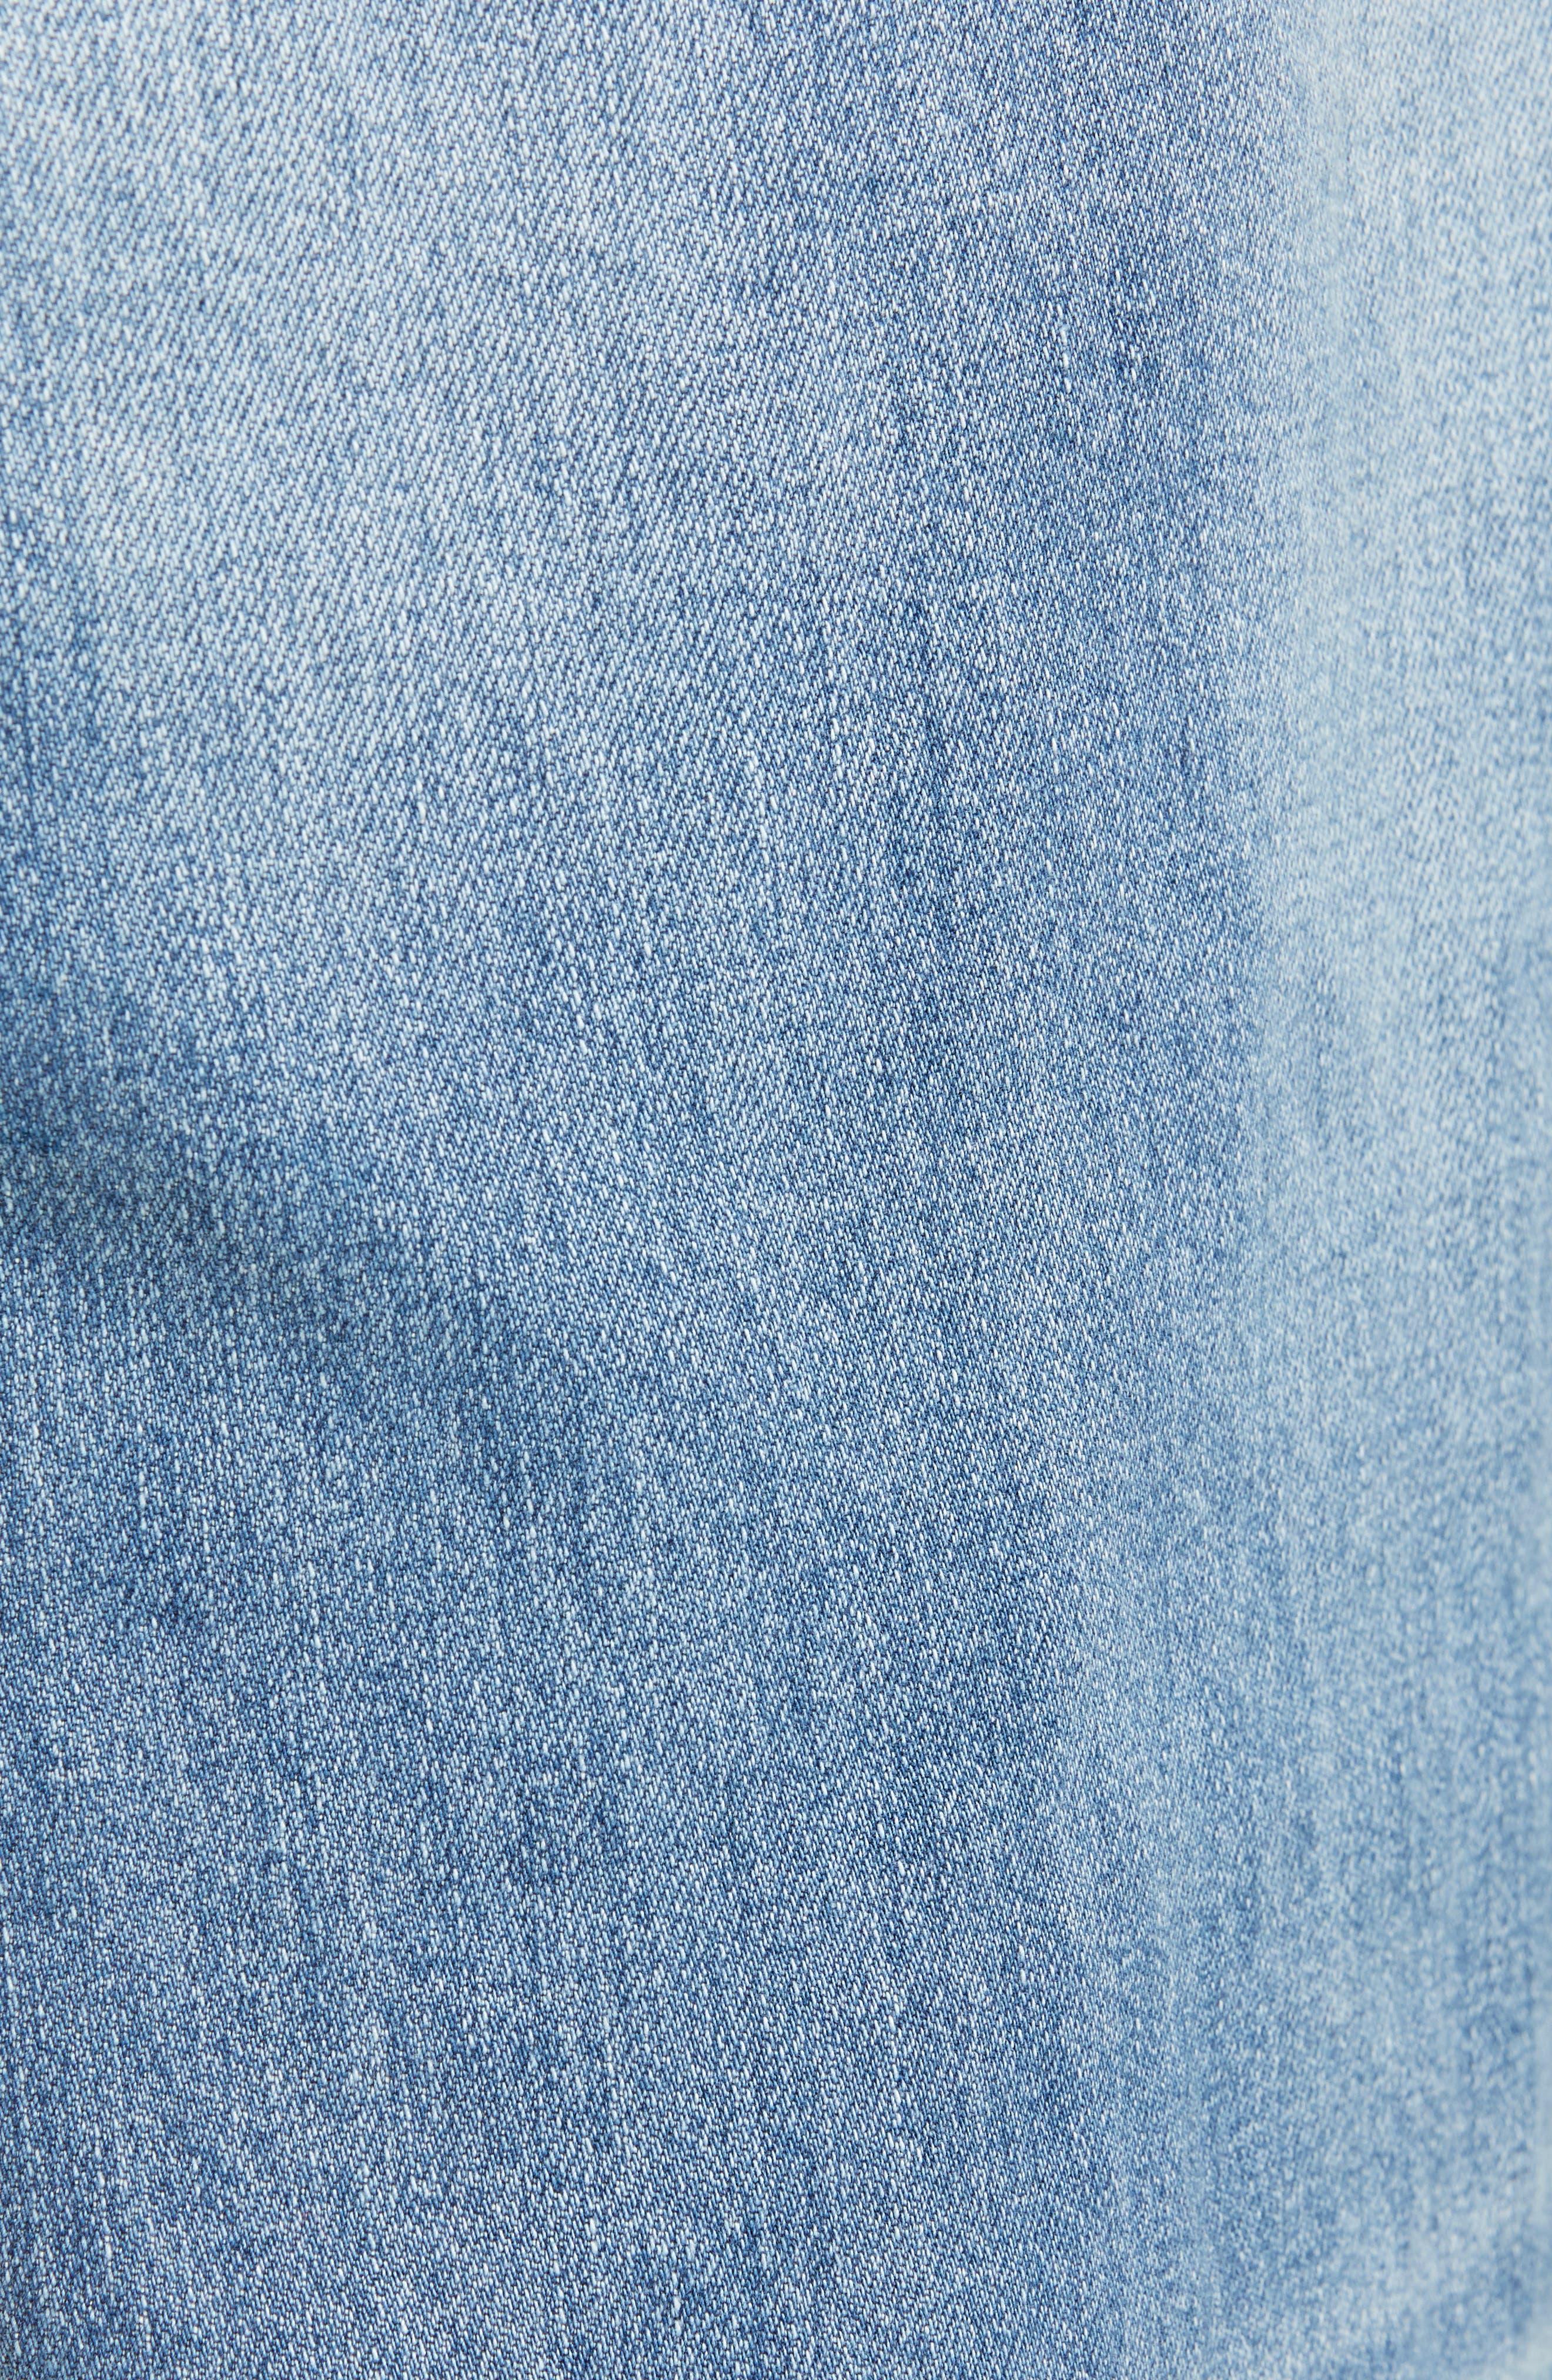 Jim Slim Fit Jeans,                             Alternate thumbnail 5, color,                             BROOME